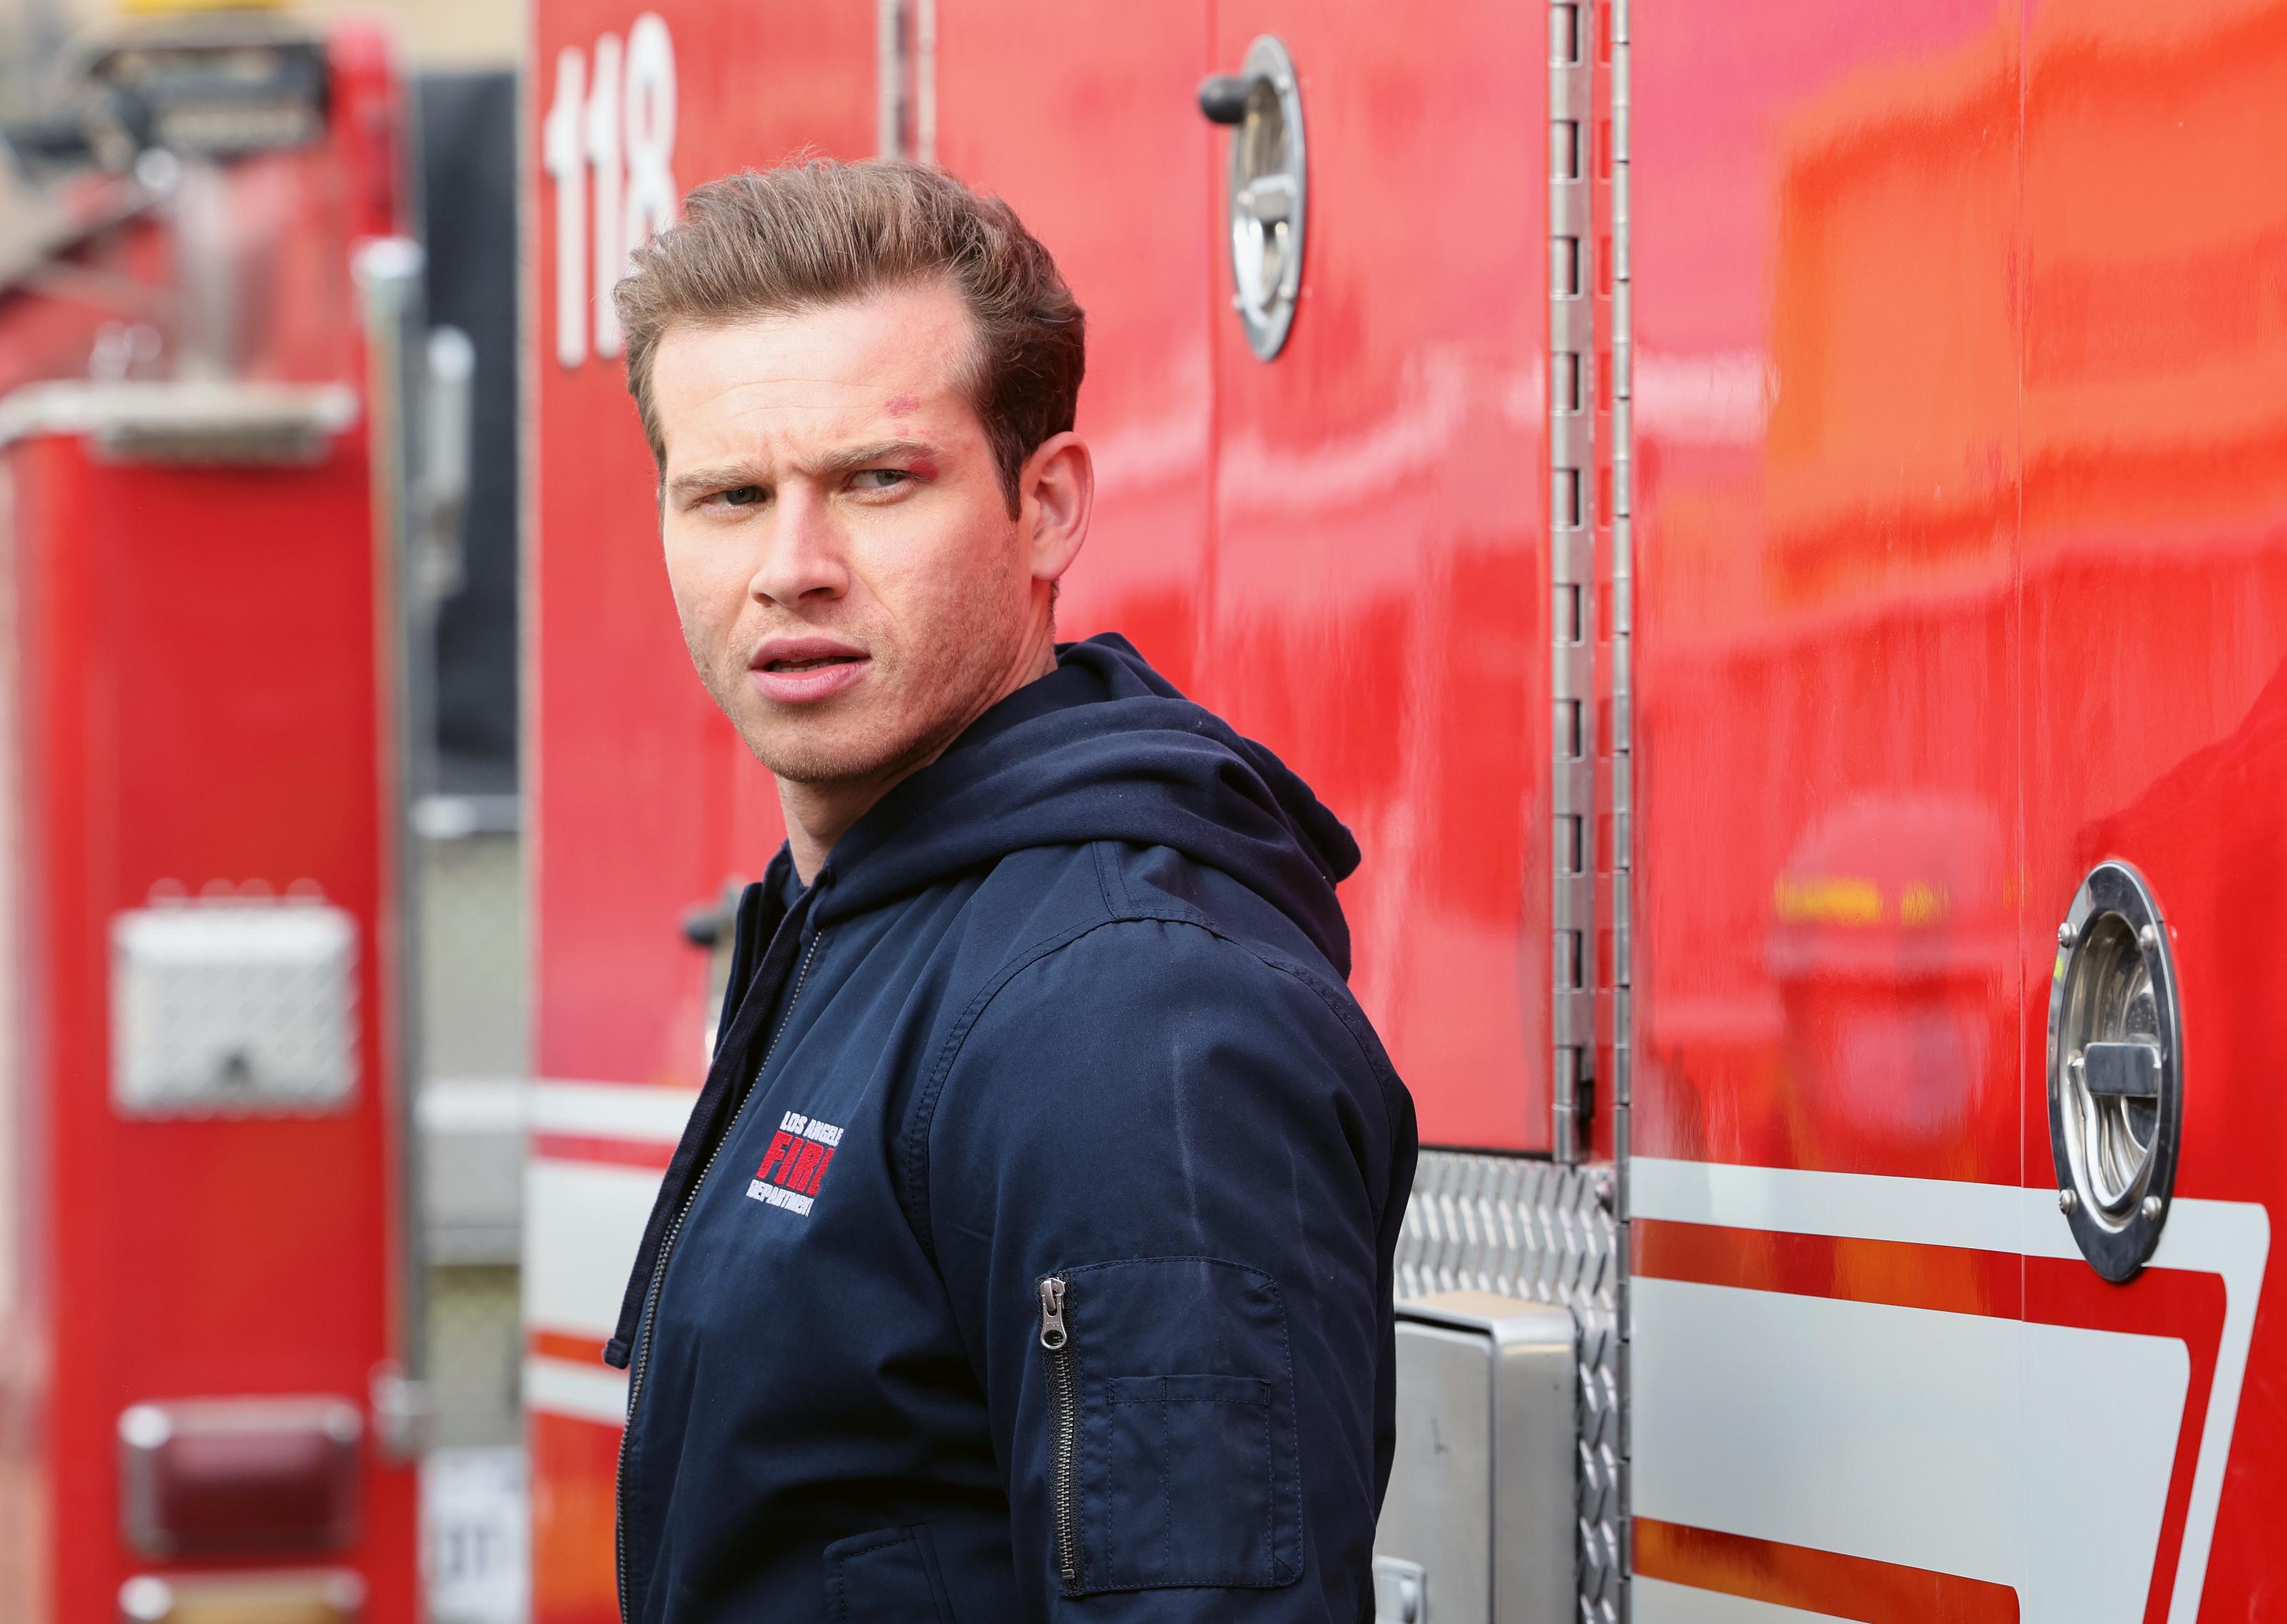 9-1-1 Season 5: Will FOX renew the first-responder drama?